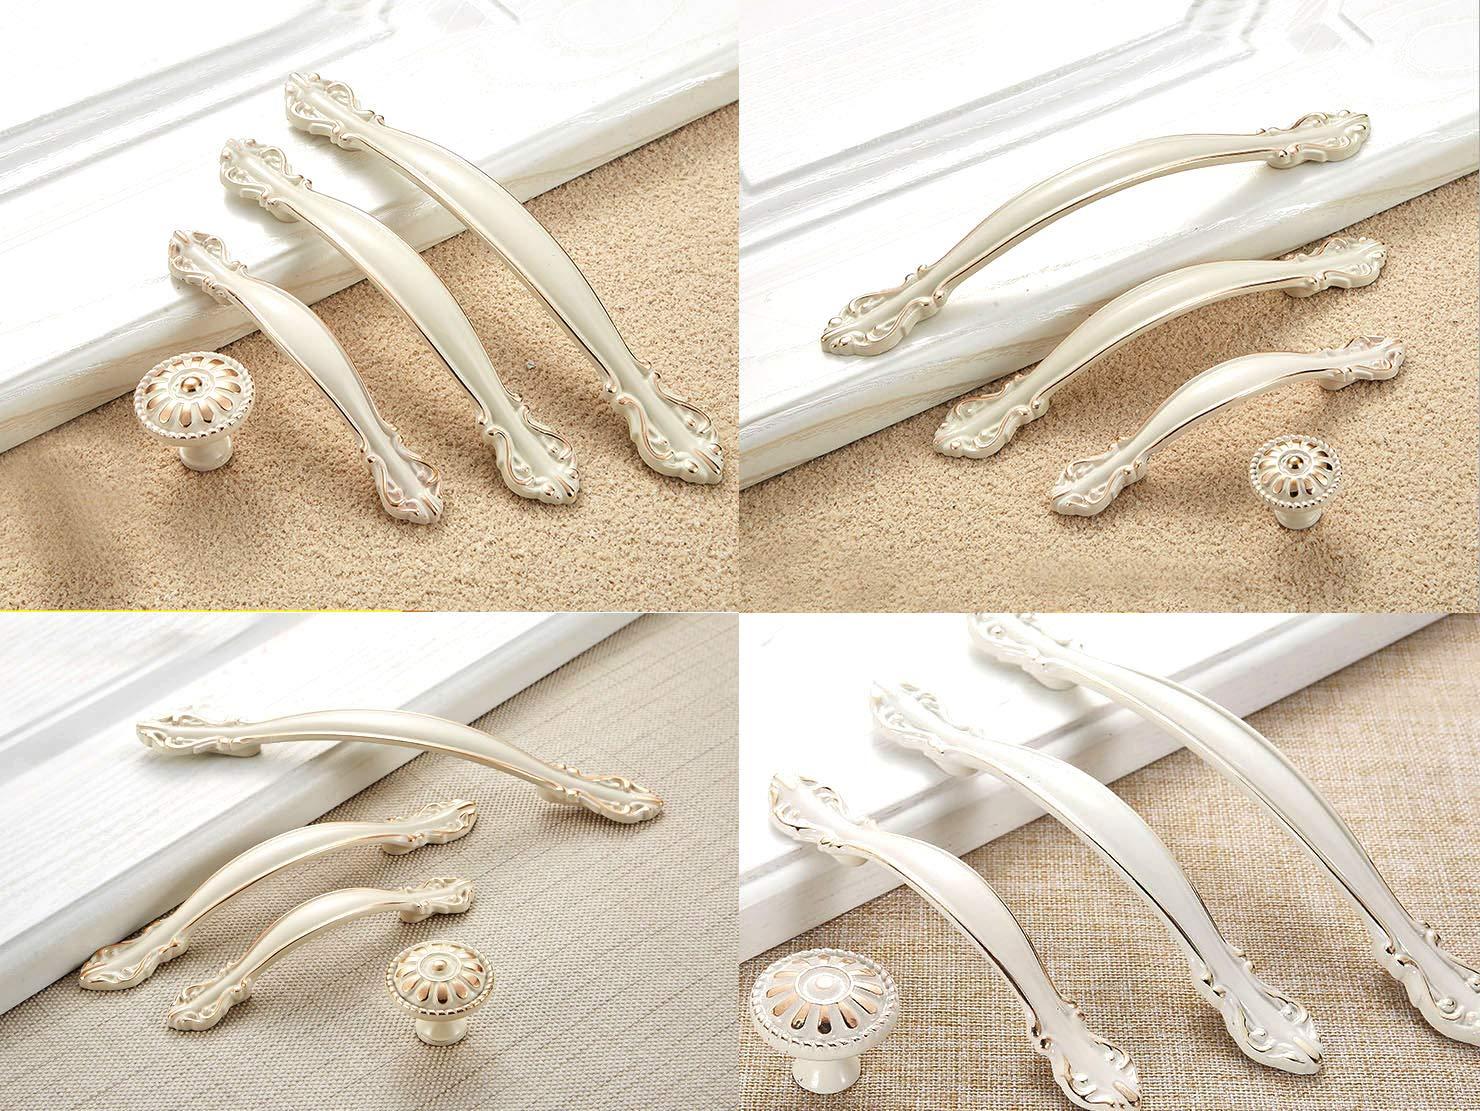 10-Pack Zinc Alloy Ivory White with Gold Edge abcGoodefg Europe Cabinet Handle 4.5 Length 2.5 Hole Centers